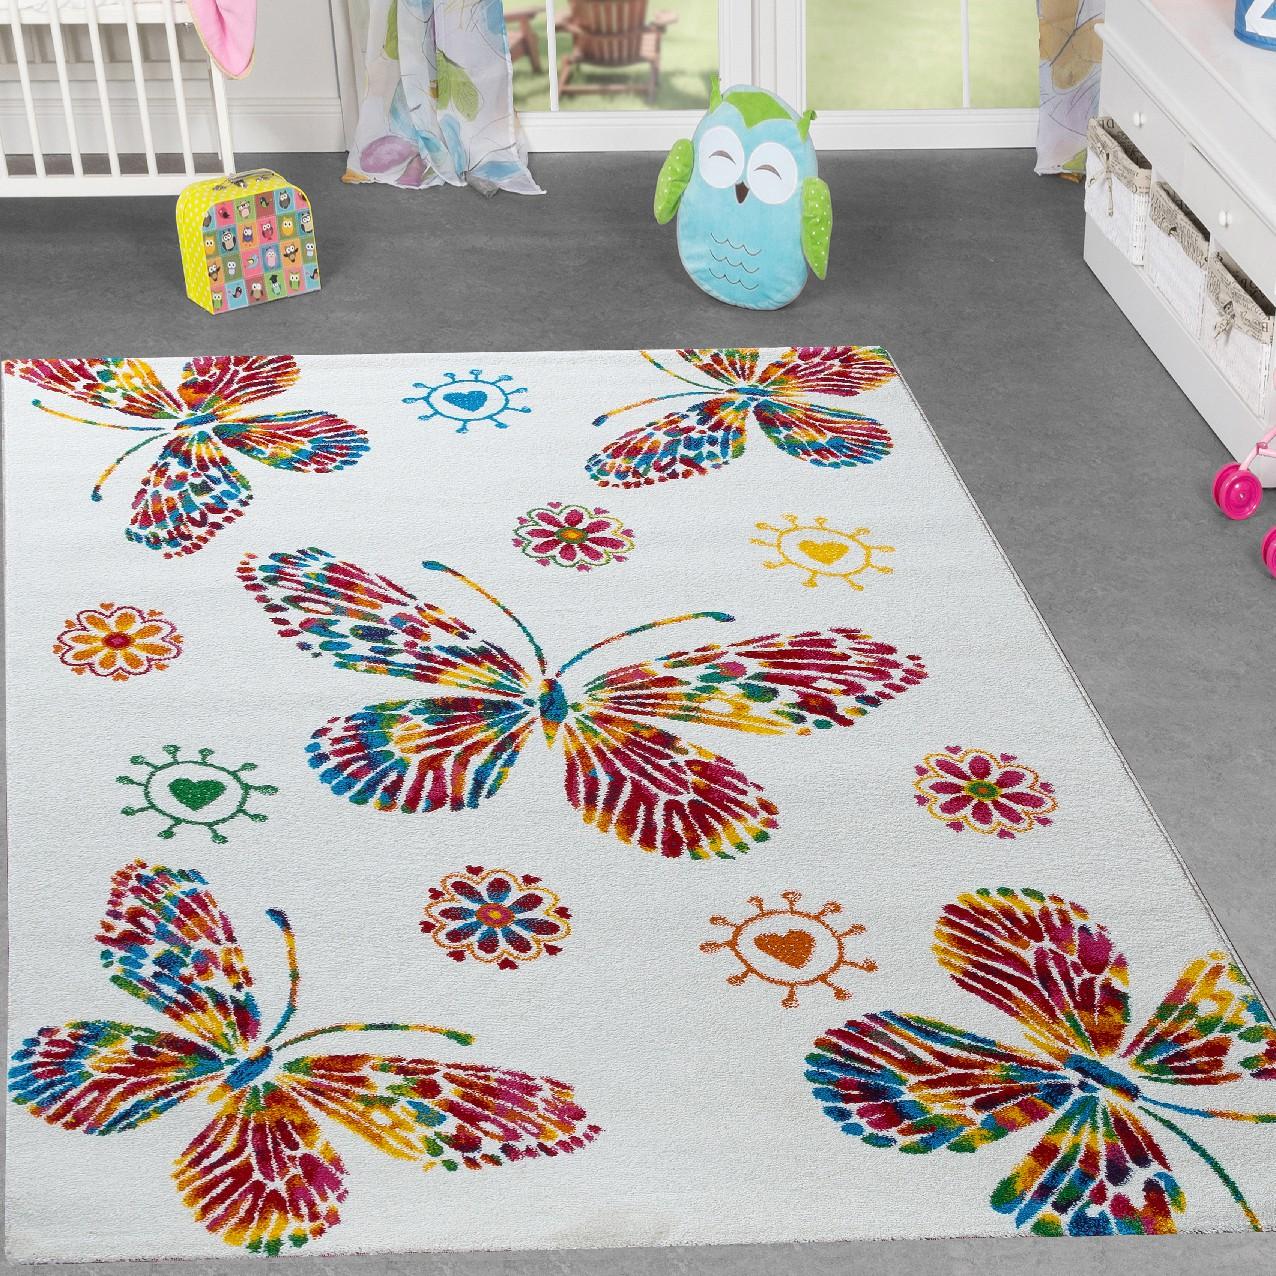 kinderteppich schmetterling design kinderzimmer spielzimmer multicolour in creme moderne teppiche. Black Bedroom Furniture Sets. Home Design Ideas